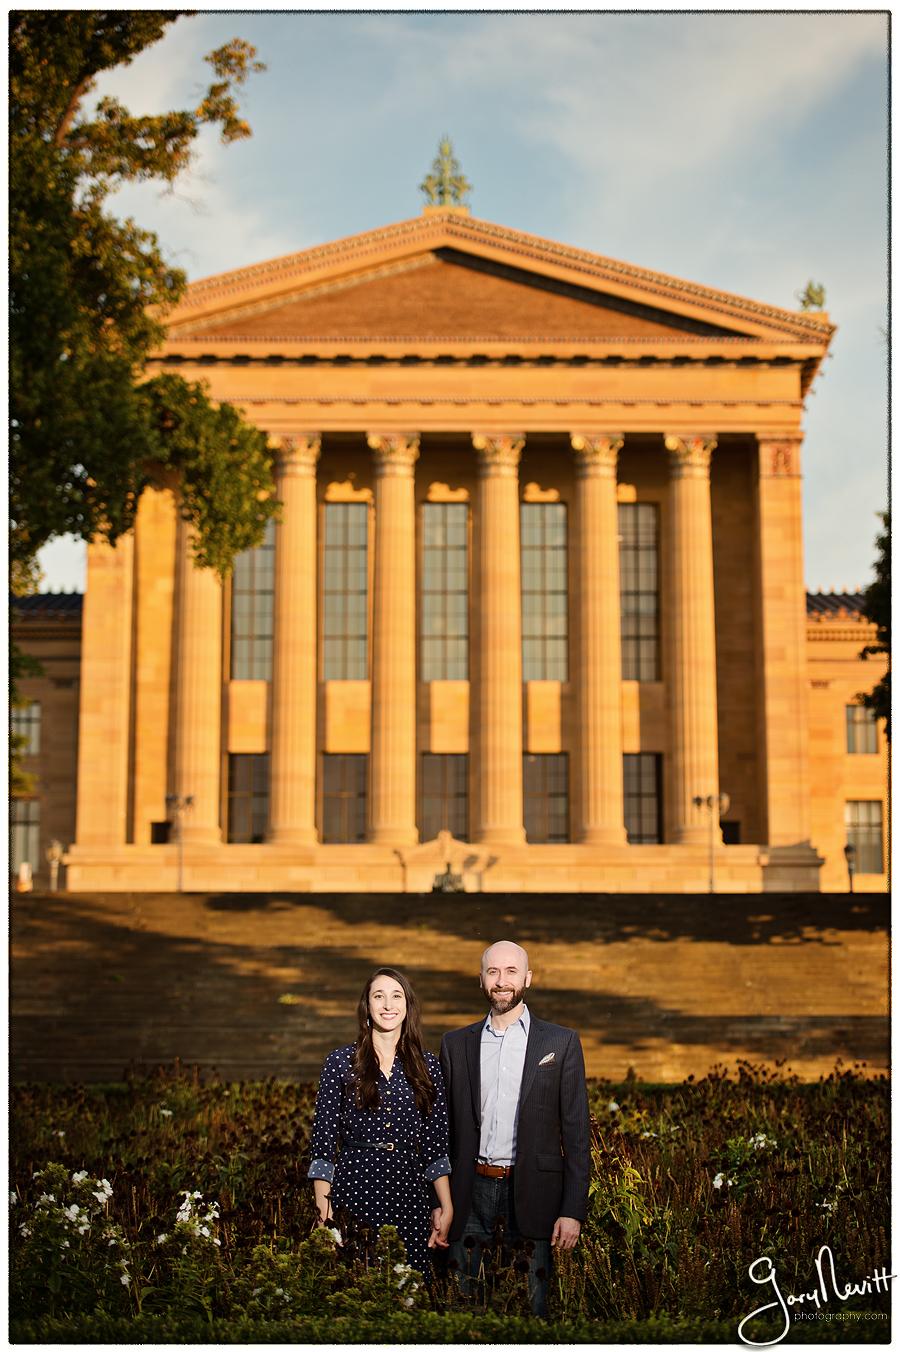 Sergel-Engagement Photography-Philadelphia Museum of Art-Gary Nevitt Photogrpahy-1054